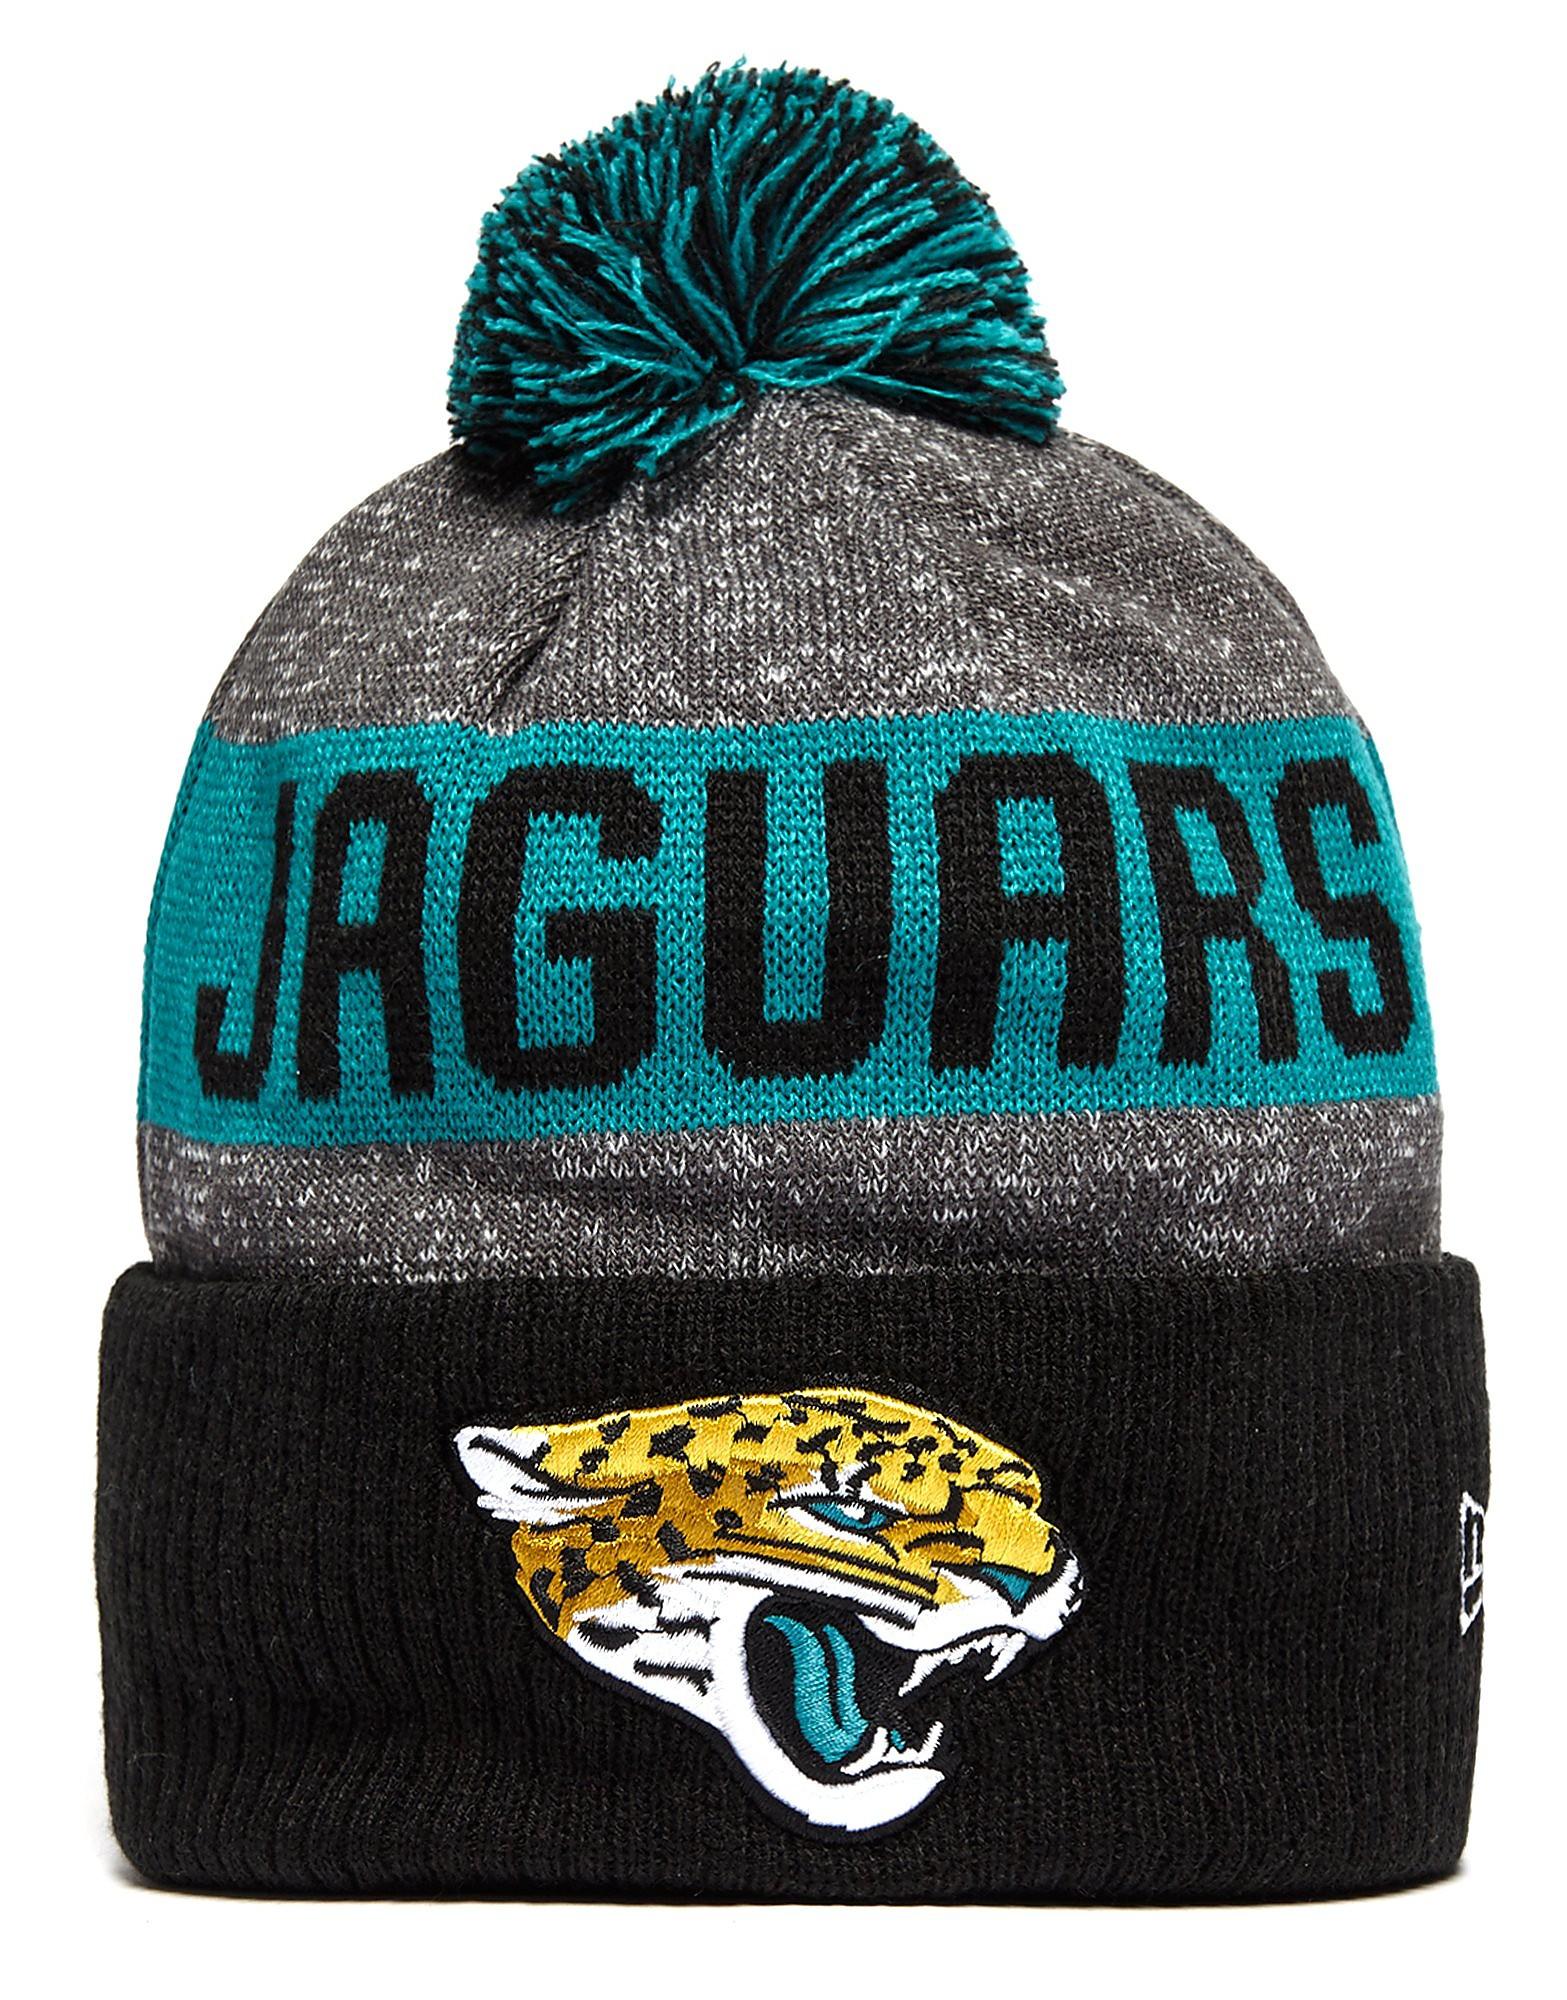 New Era NFL Jacksonville Jaguars Pom Beanie